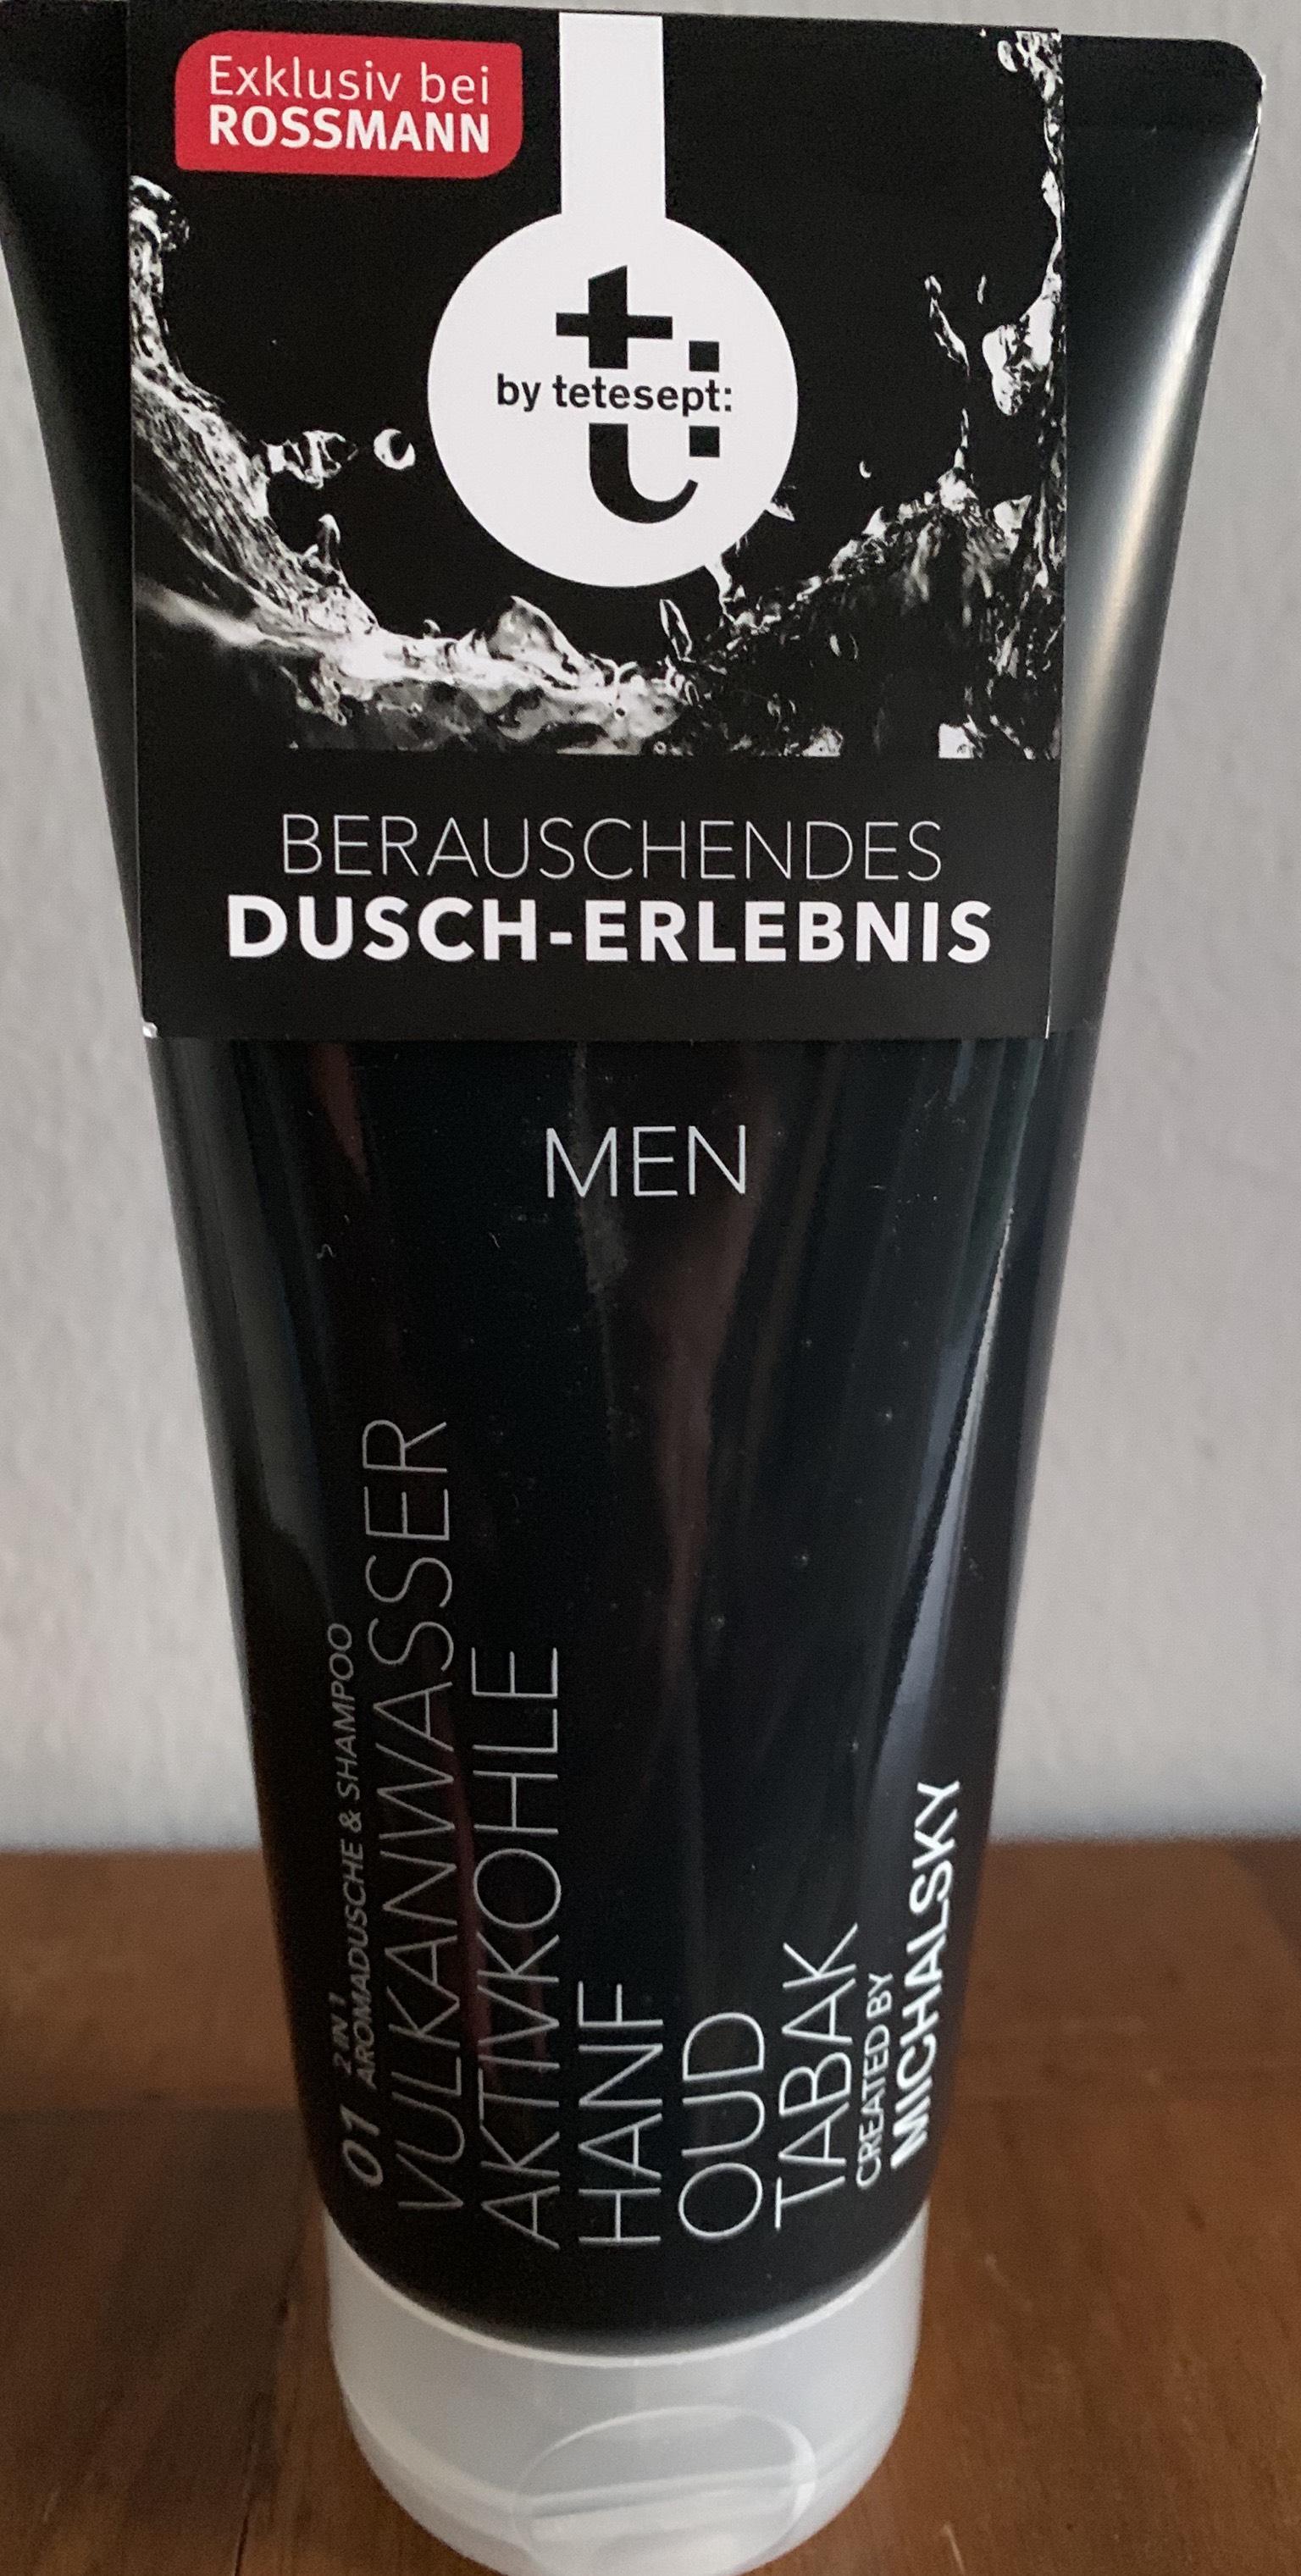 Aromadusche & Shampoo 01 created by Michalsky bei Rossmann